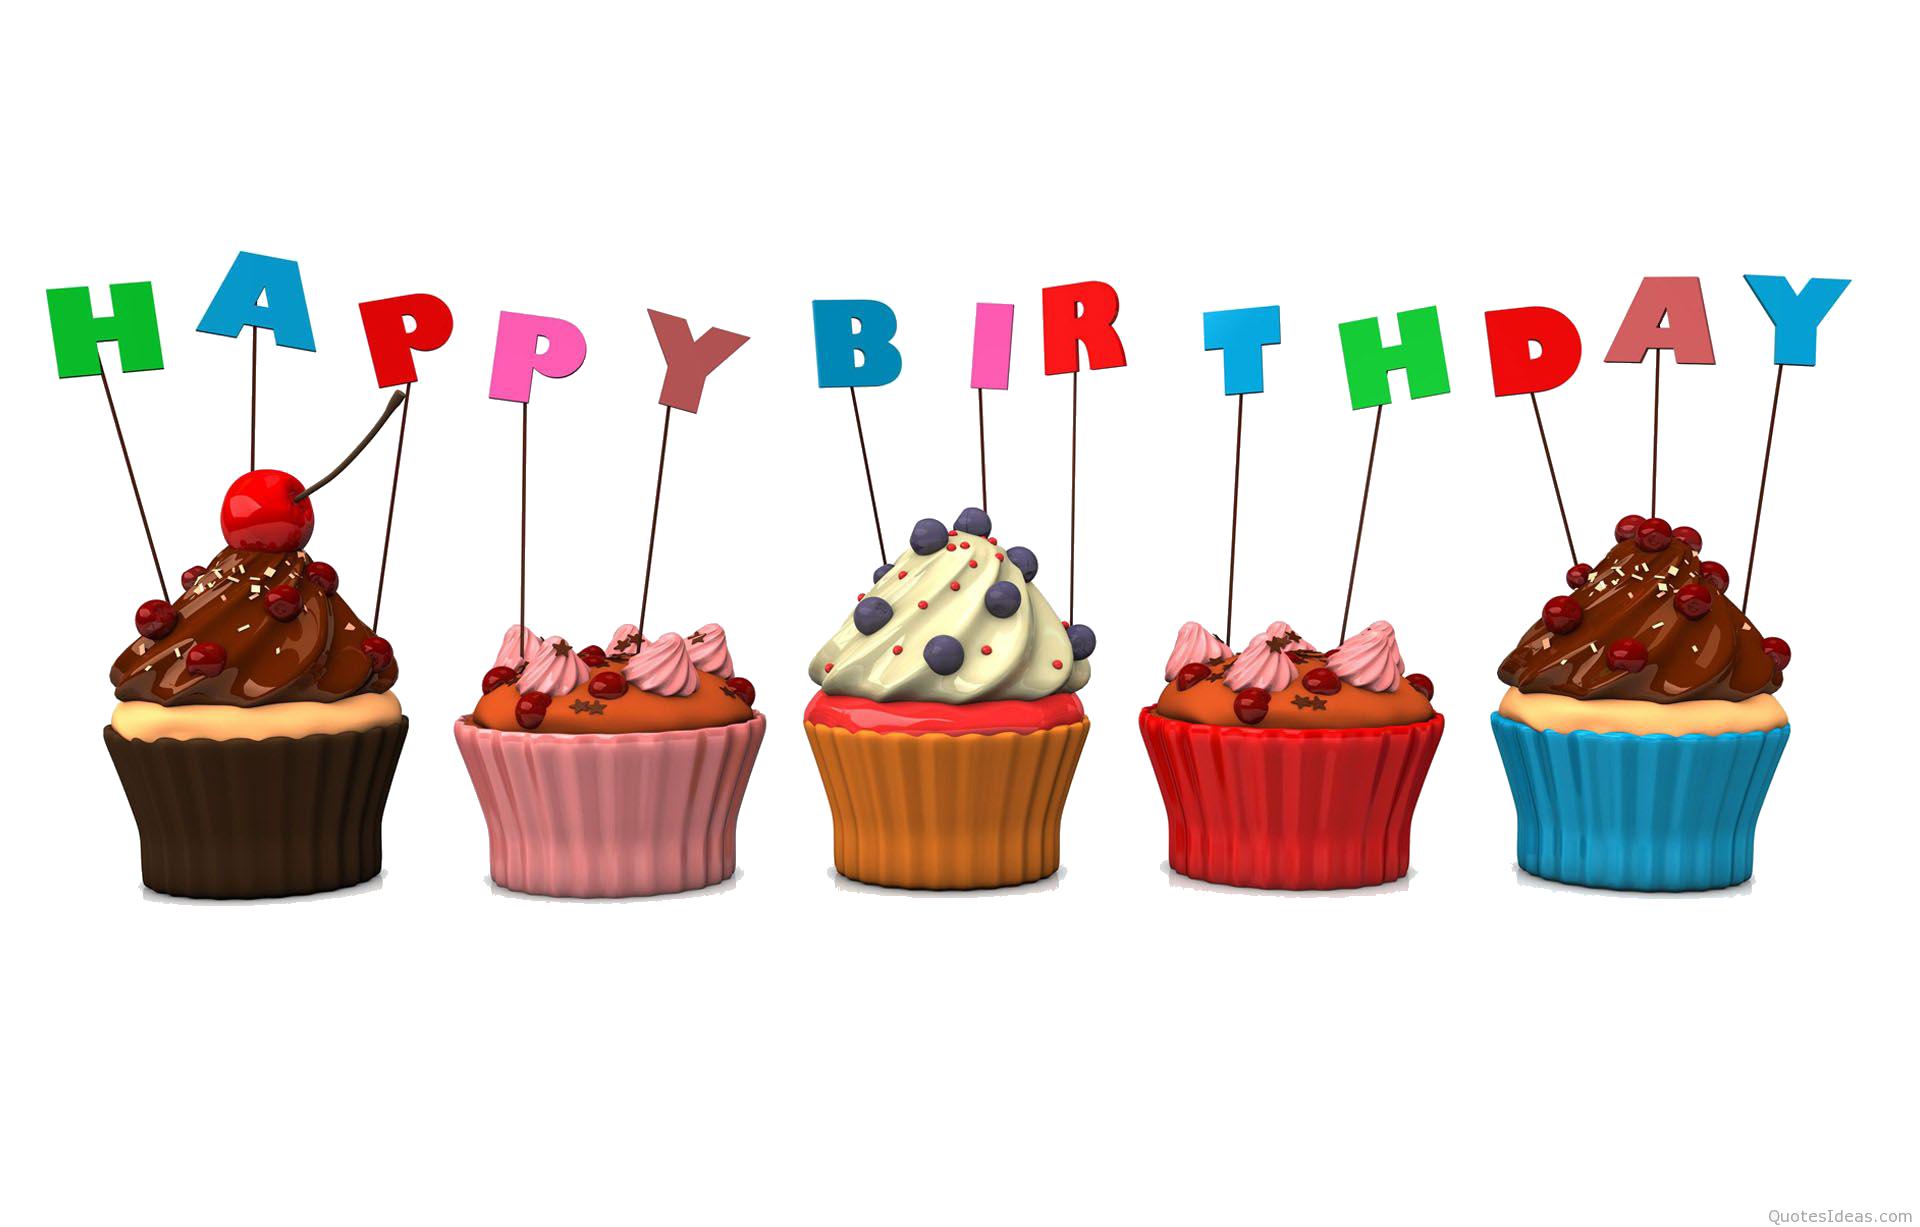 Download Free Birthday Cake Hd ICON favicon FreePNGImg